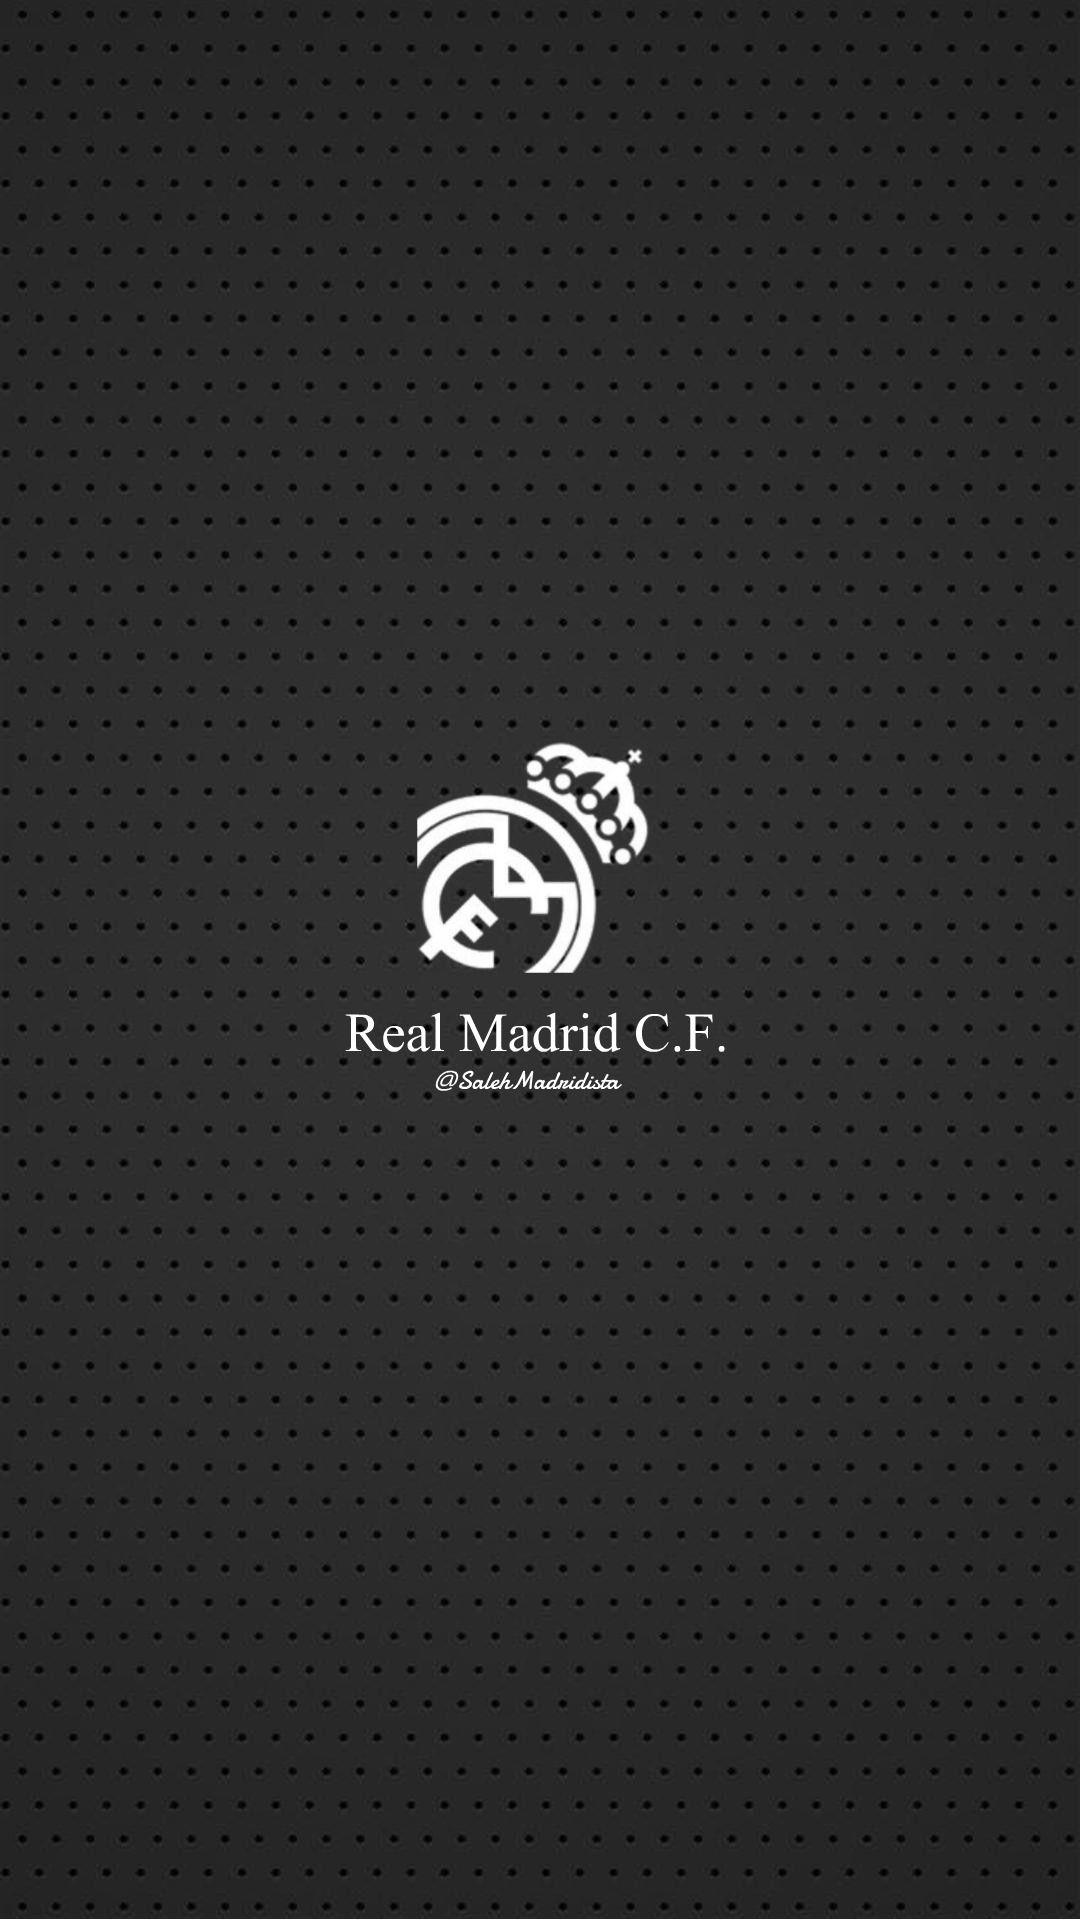 Halamadrid Real Madrid 3d Wallpaper By Alhilaldesigner Real Madrid Wallpapers Madrid Wallpaper Real Madrid Logo